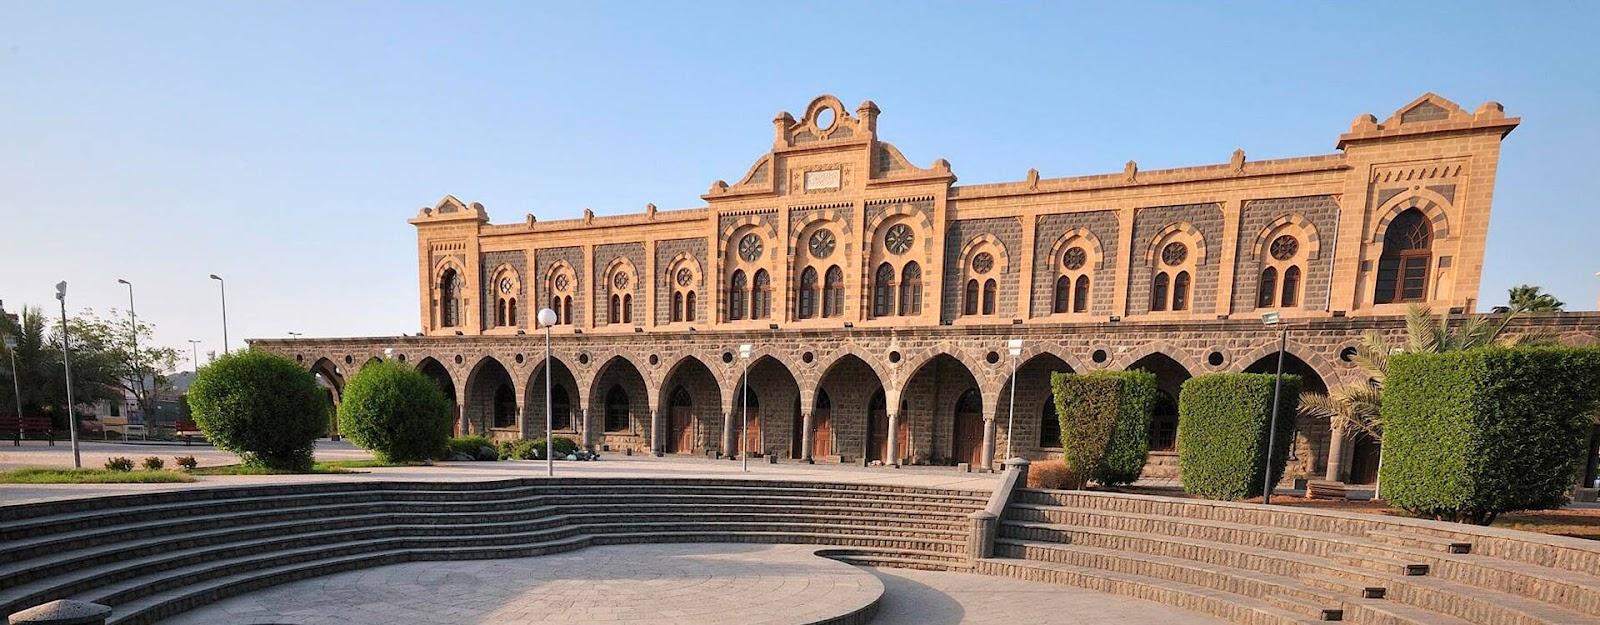 Al-Madina Museum, Madinah, Saudi Arabia